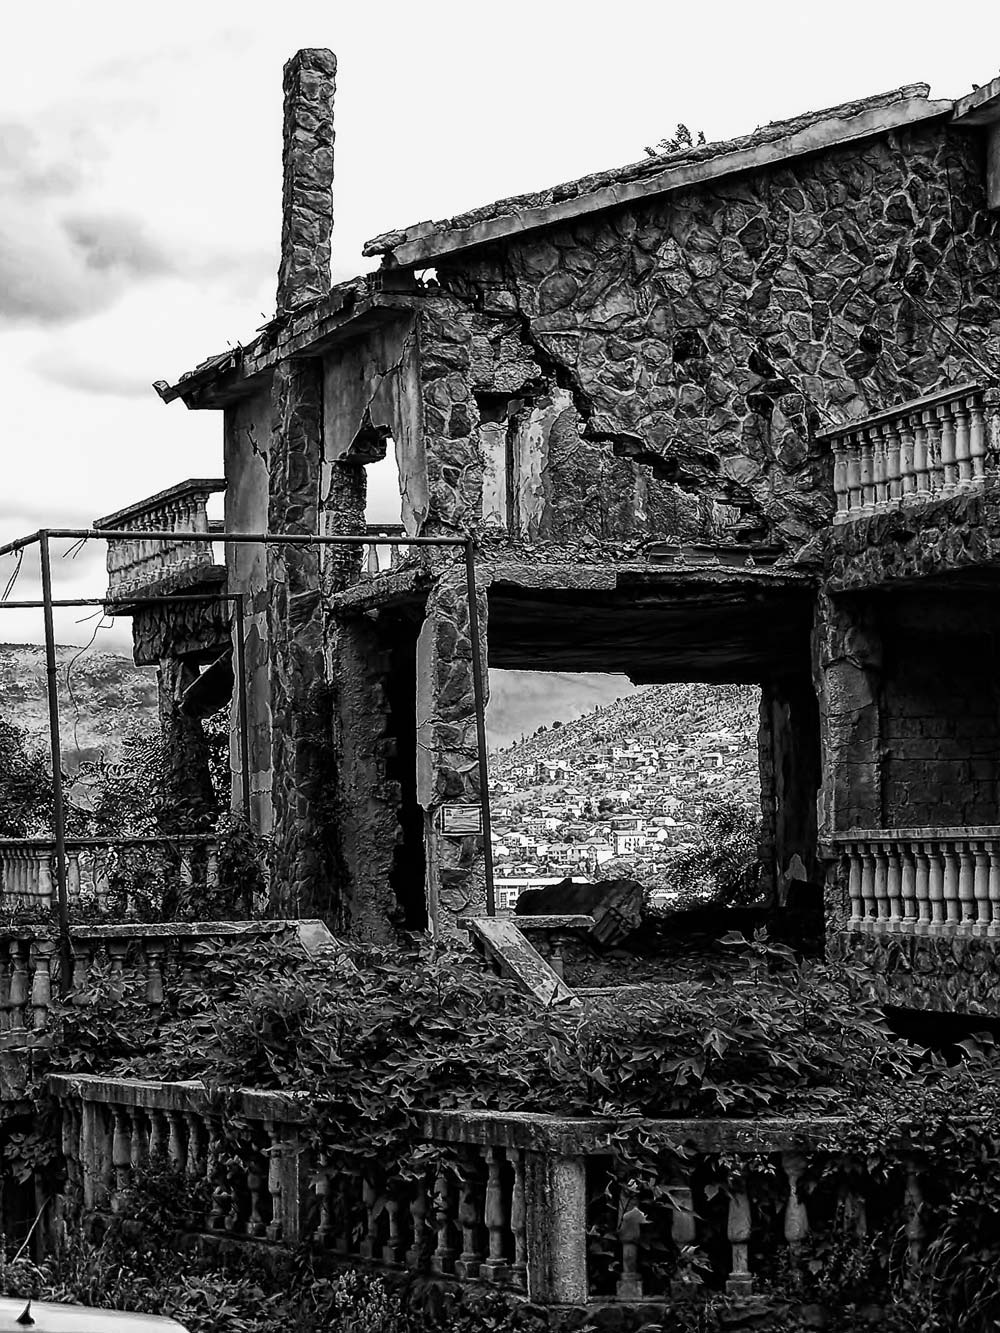 Damaged family home in Eastern Mostar, Bosnia & Herzegovina